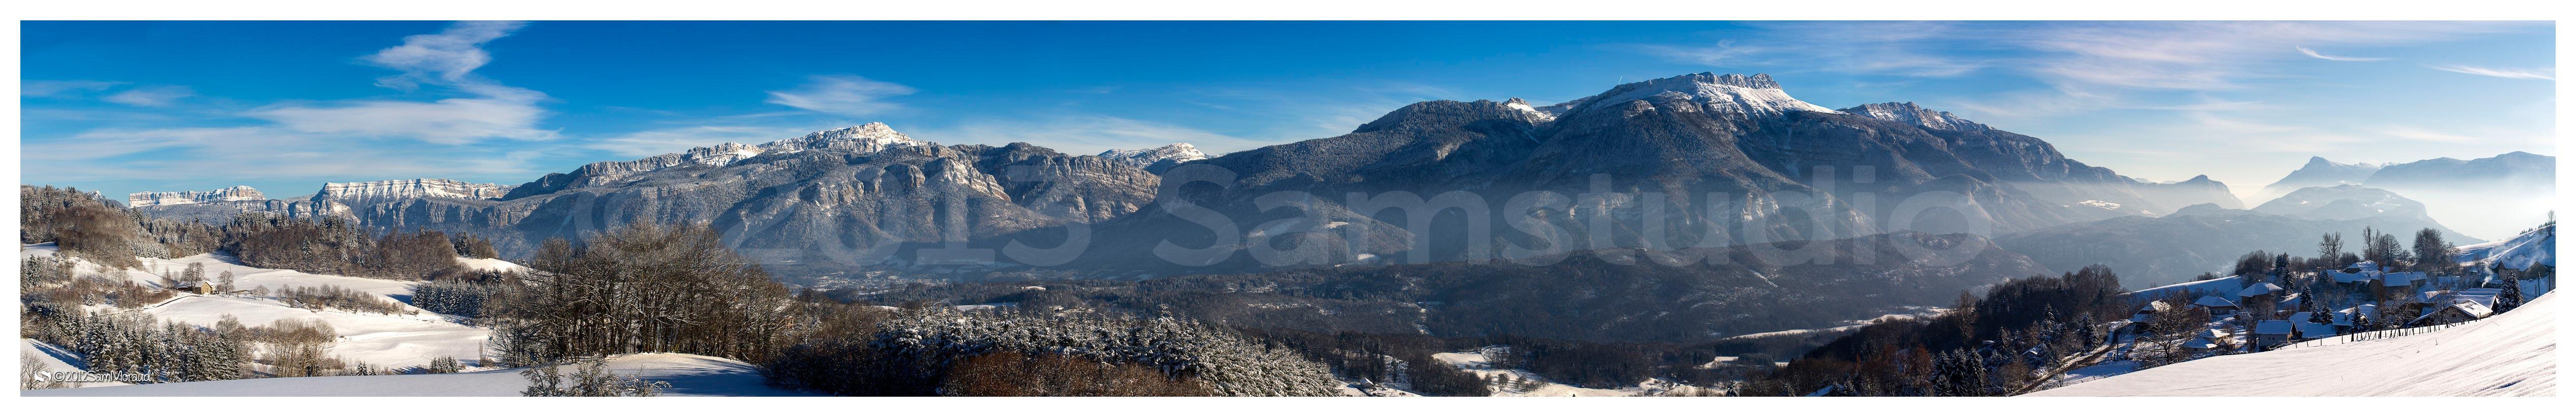 Photo panoramique géante